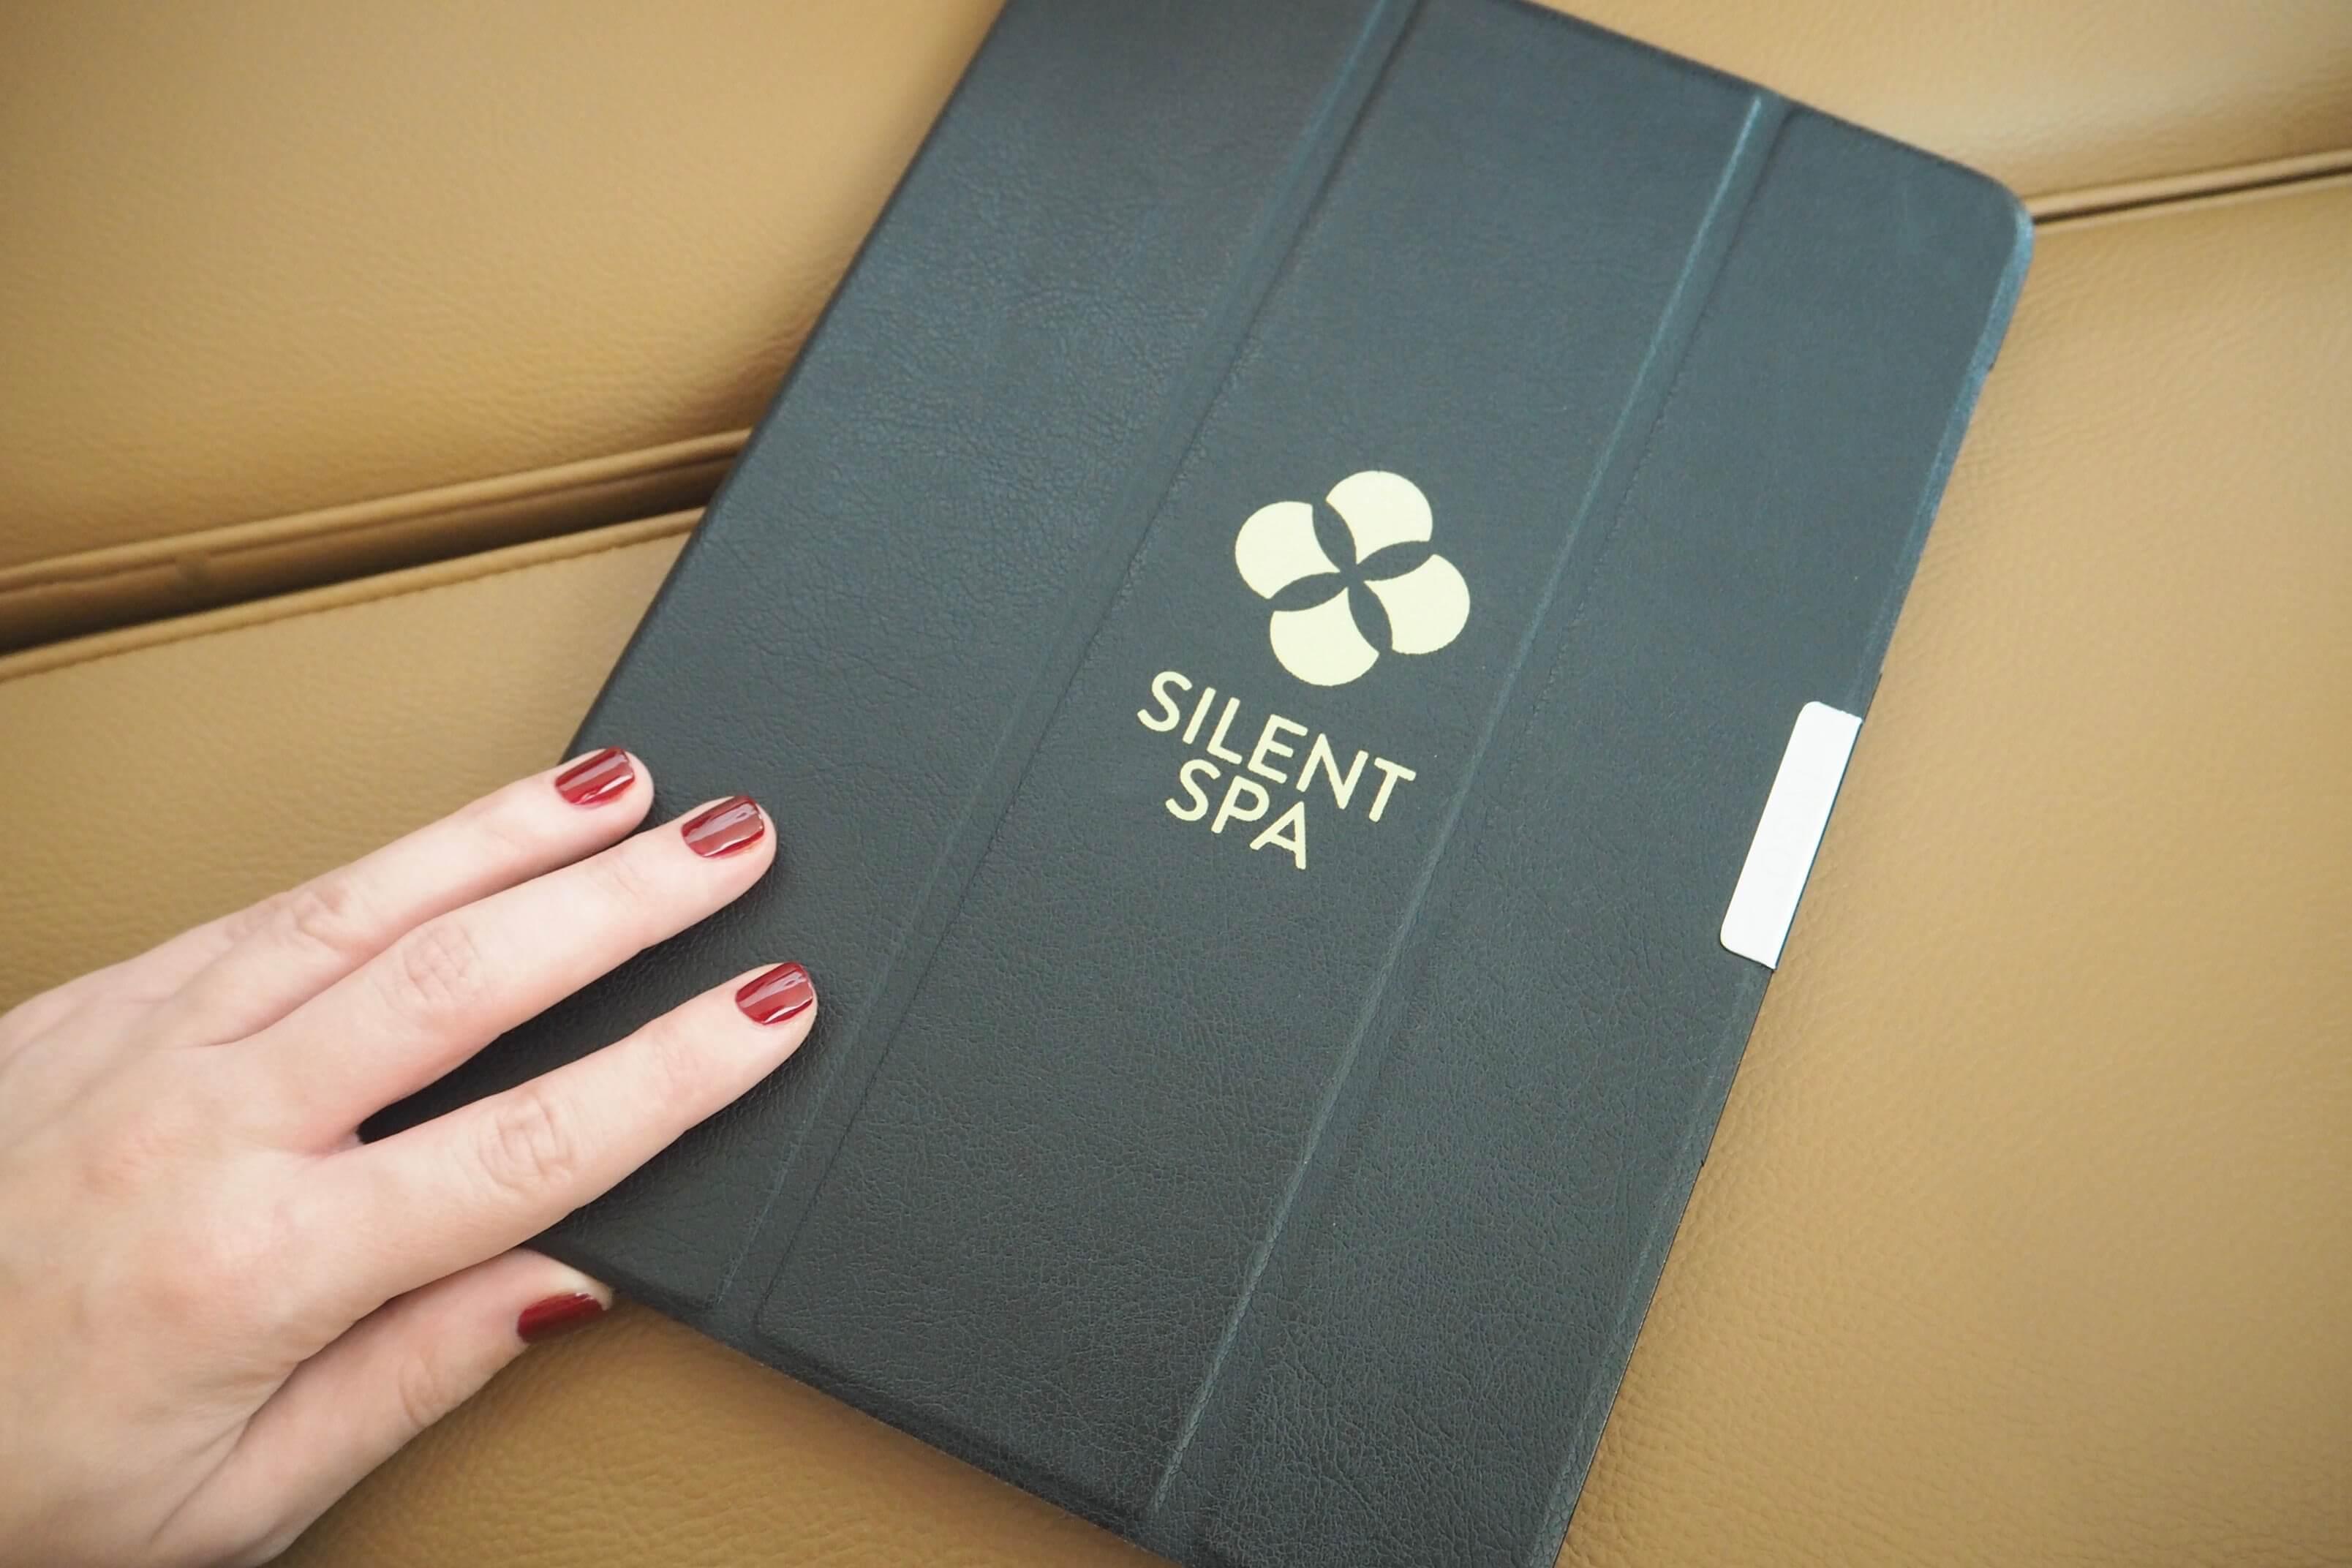 Silent Spa Entertainment